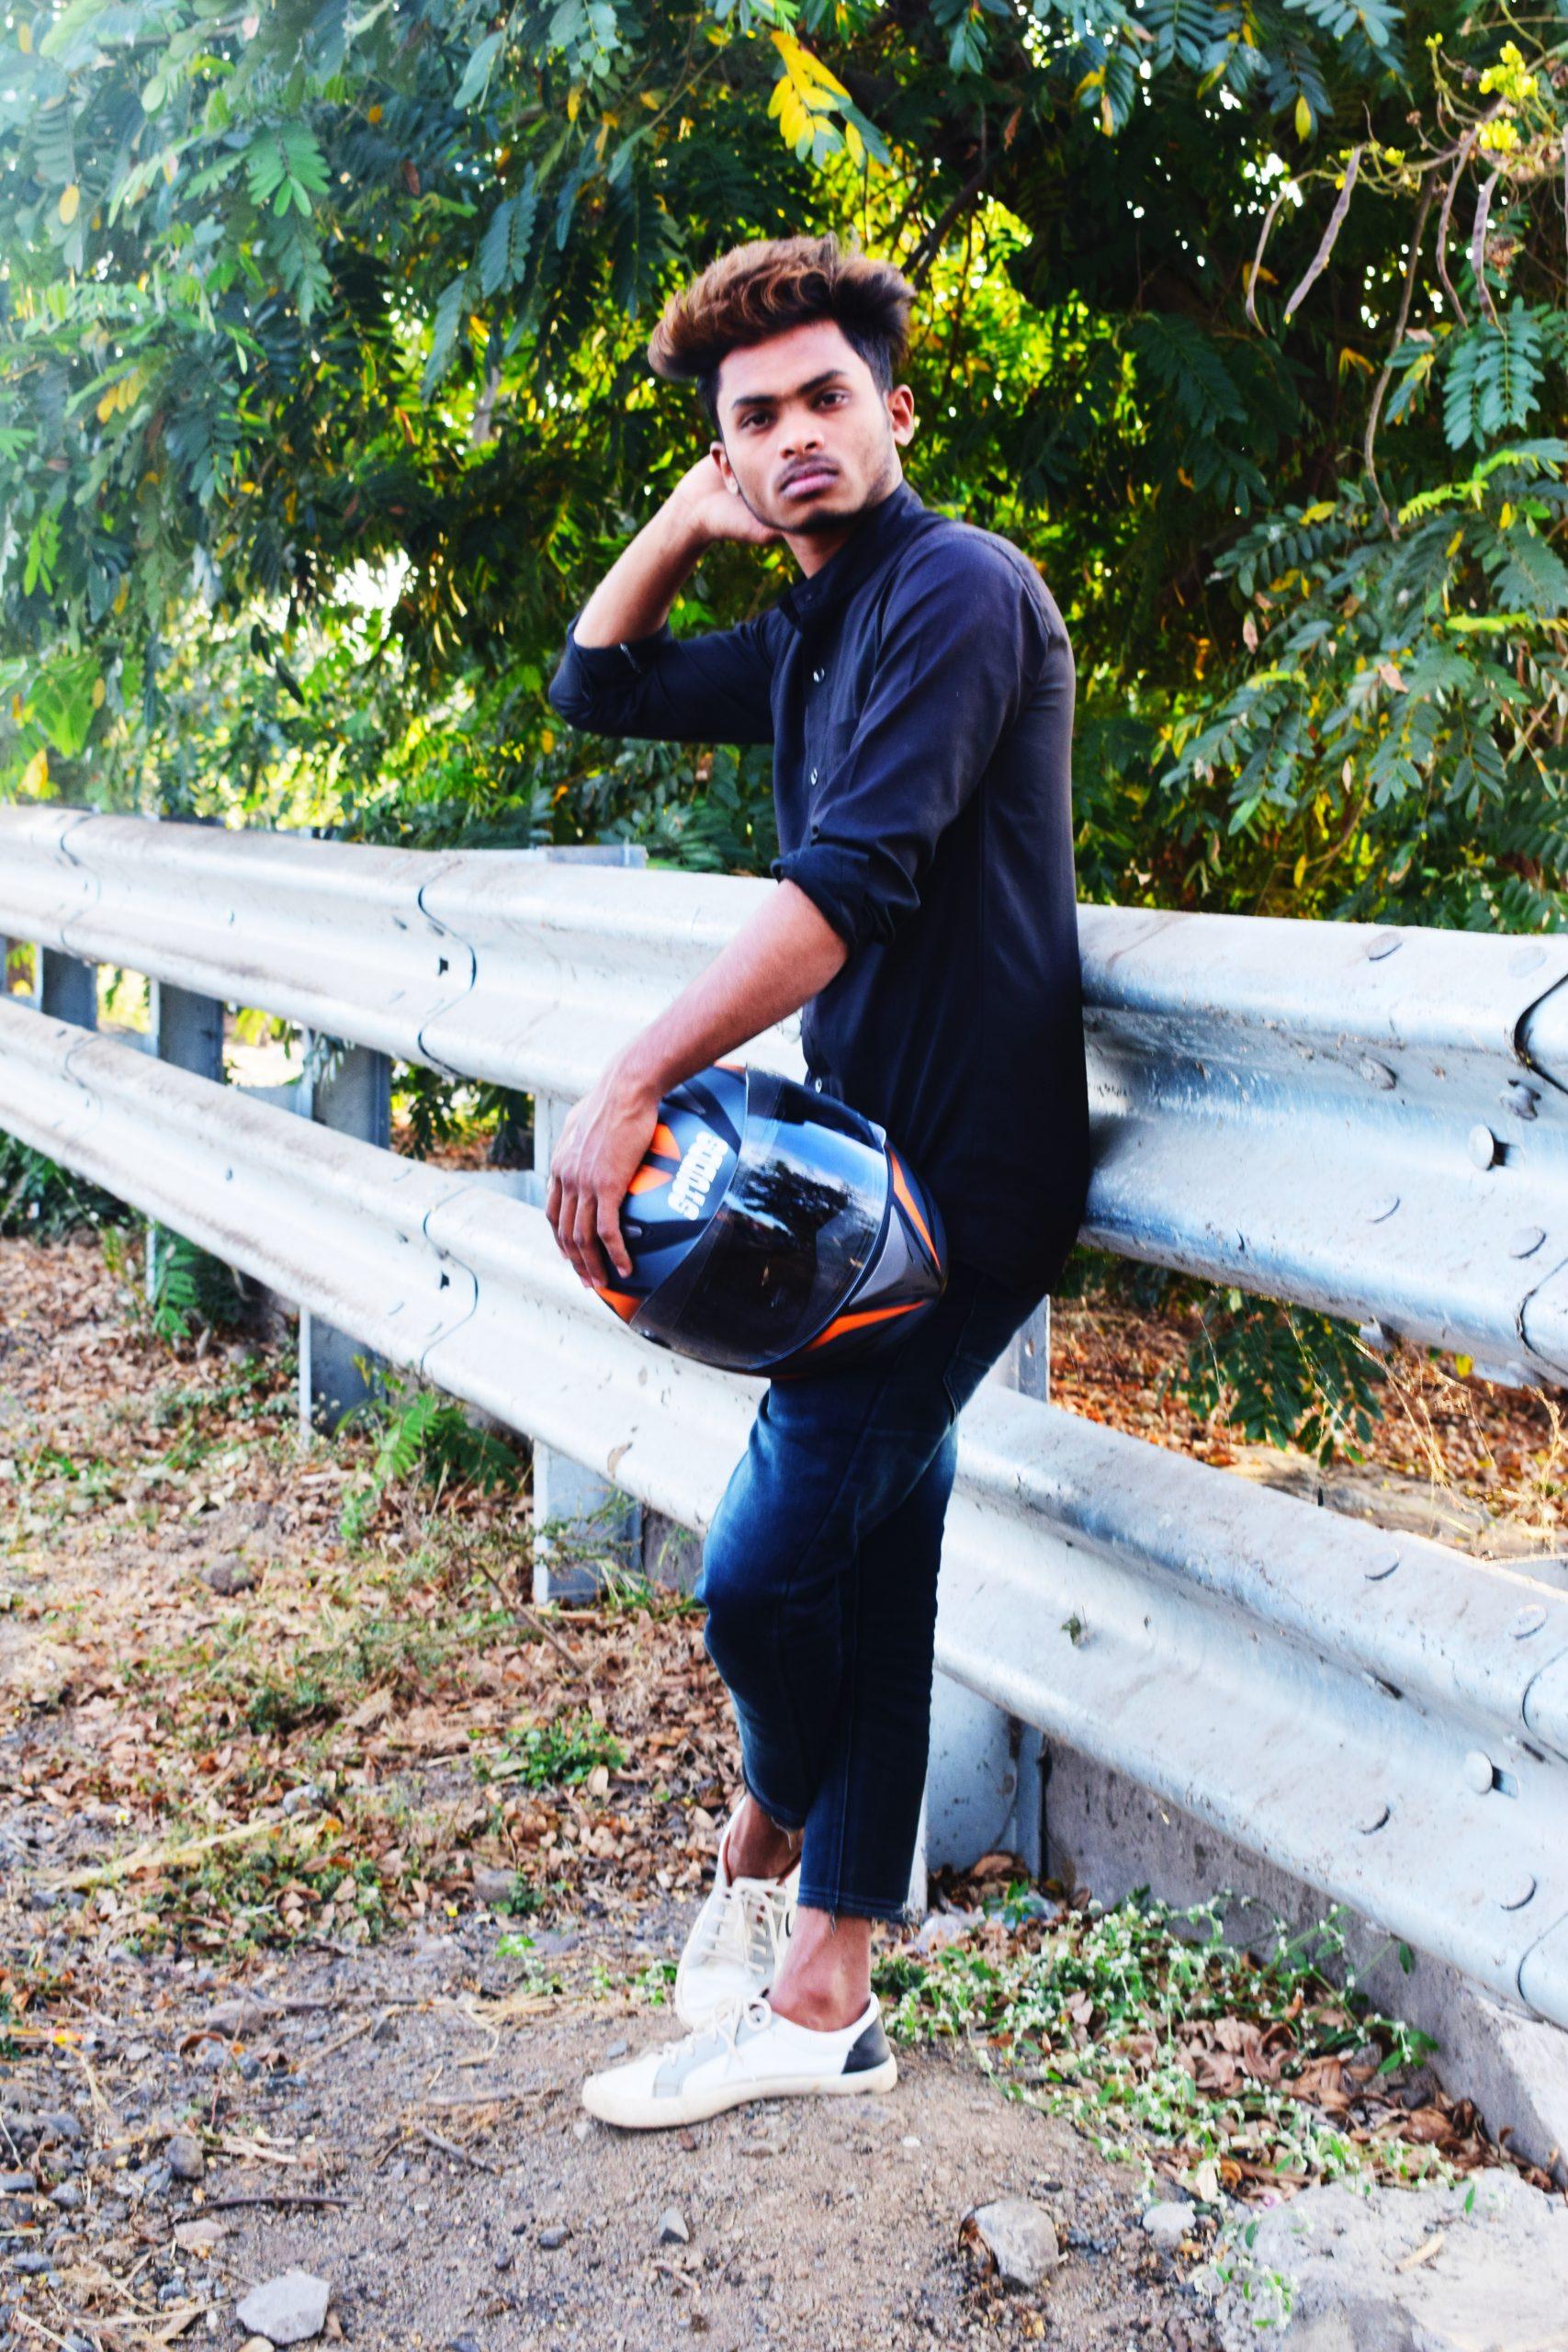 A boy with helmet